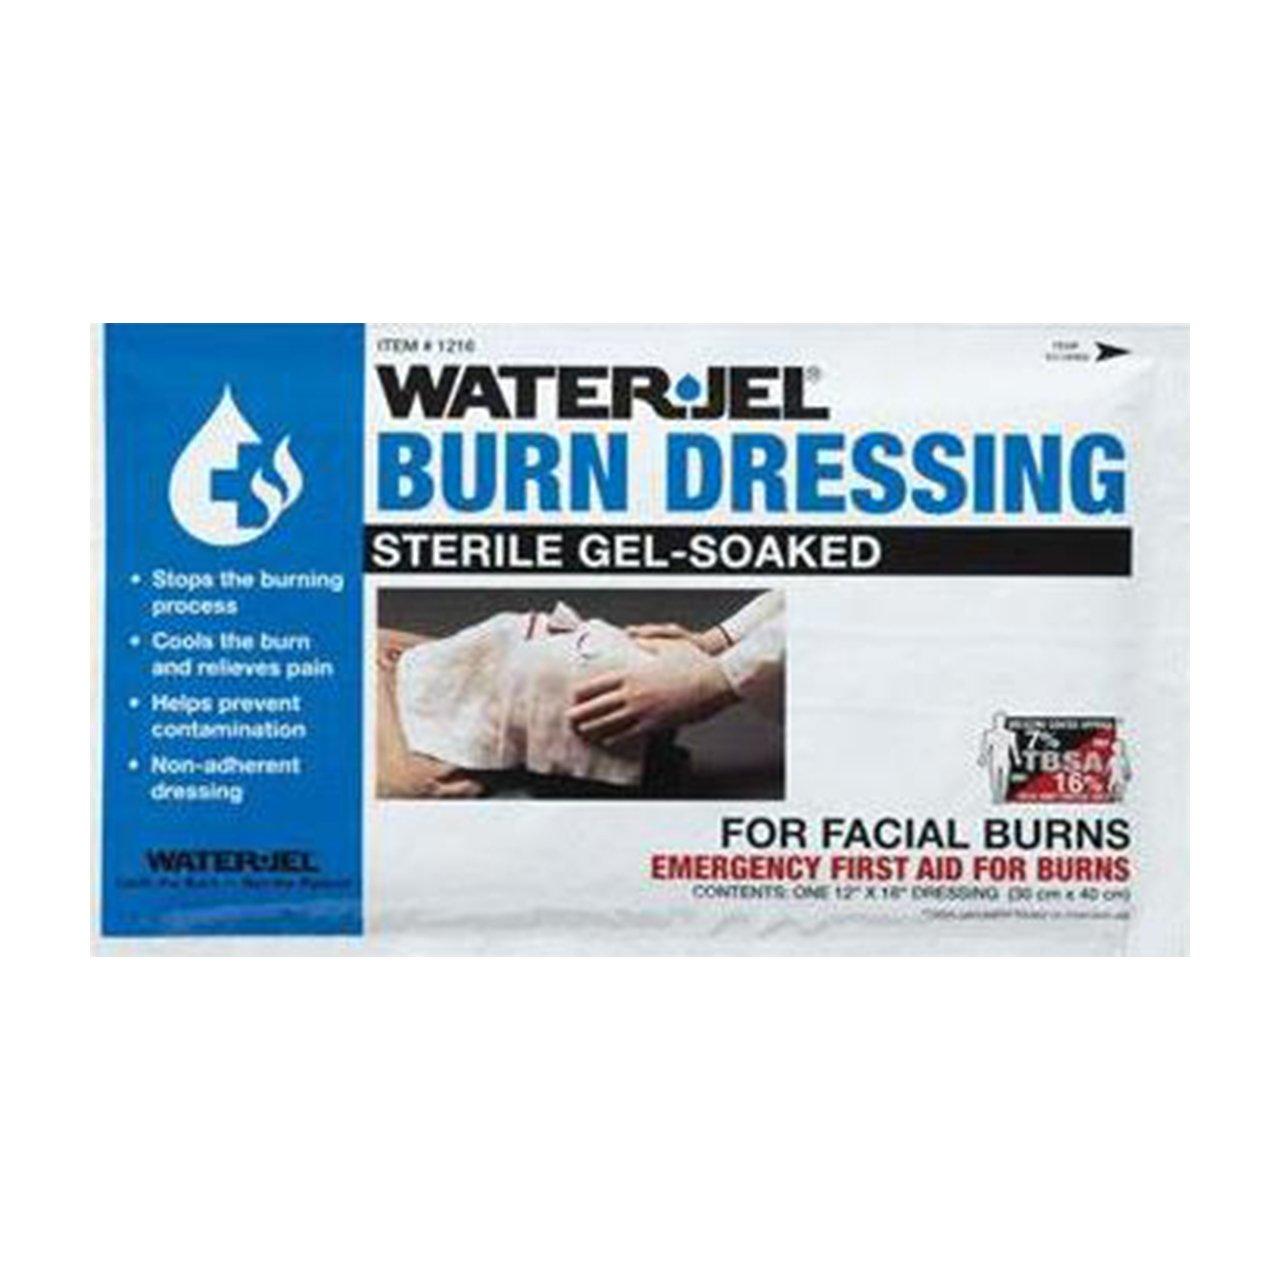 WaterJel 12''x16'' Burn Dressing from Rescue Essentials